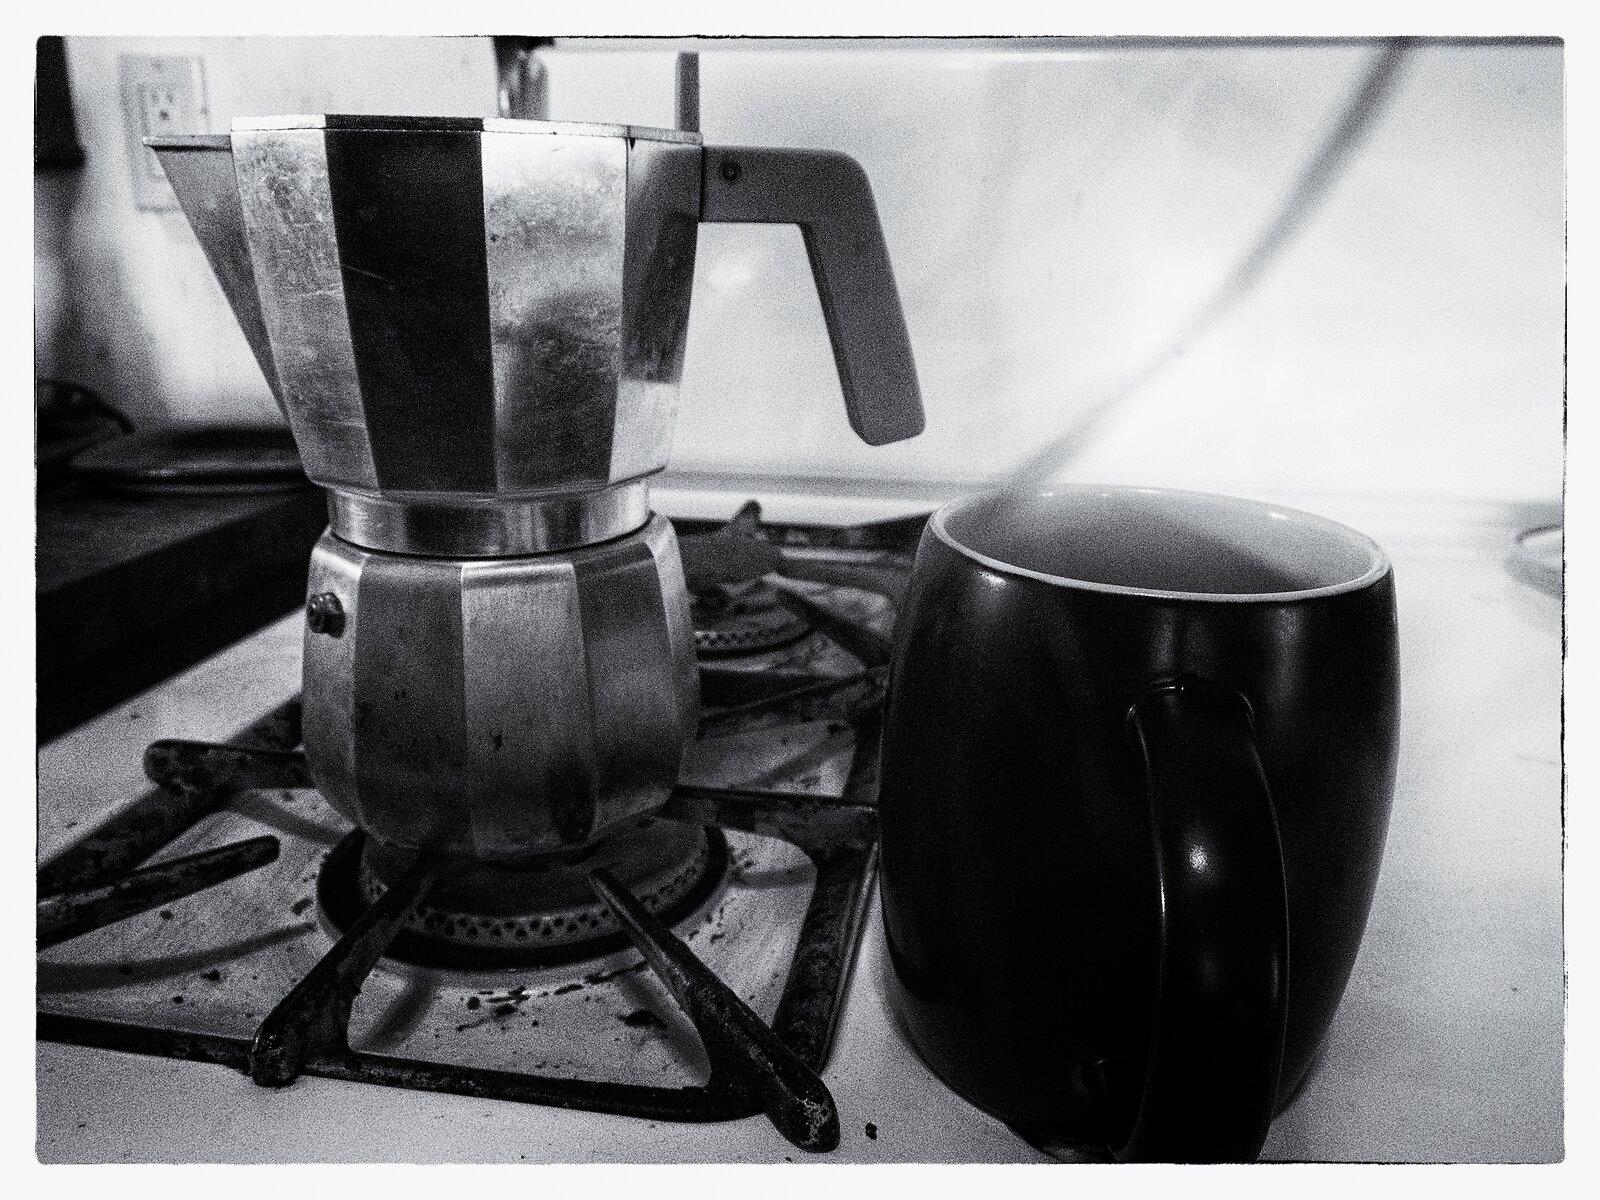 X30_Oct30_Stovetop_espresso.jpg